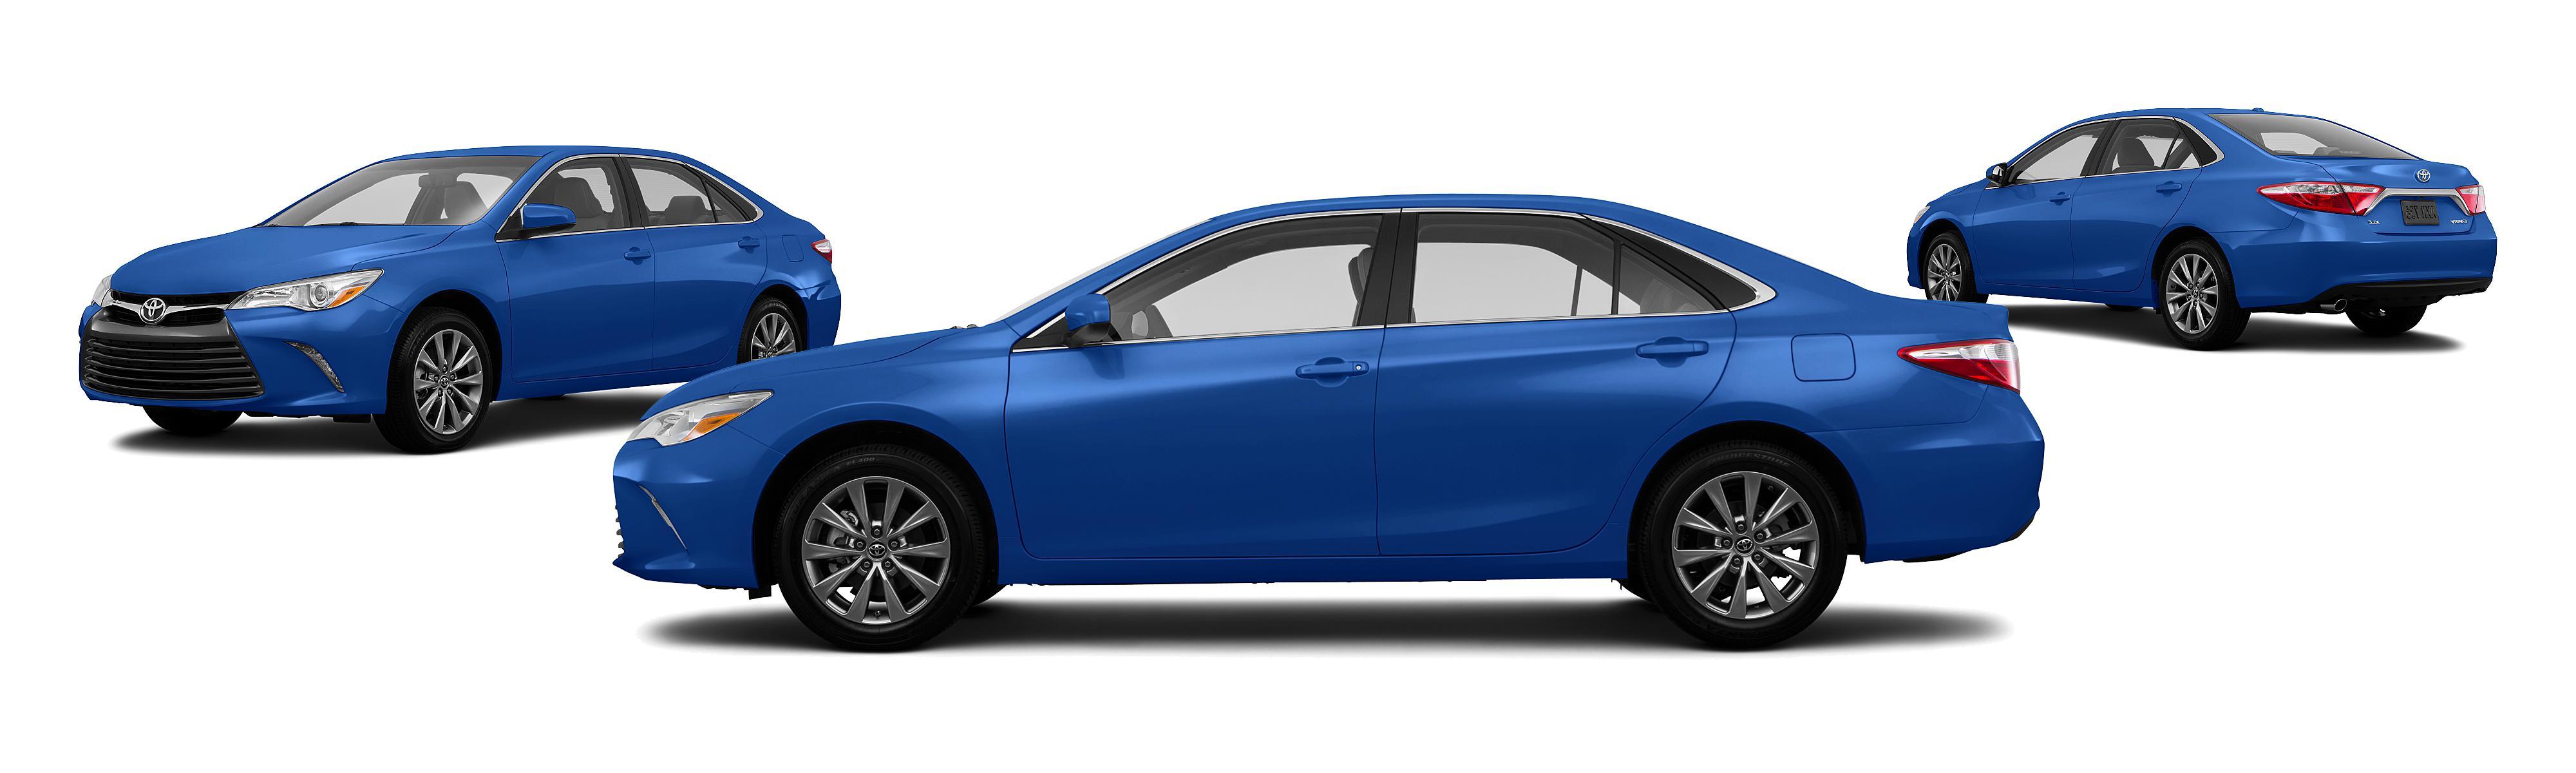 2017-toyota-camry-xle-4dr-sedan-blue-streak-metallic-composite-large Wonderful toyota Camry 2008 Le Tire Size Cars Trend